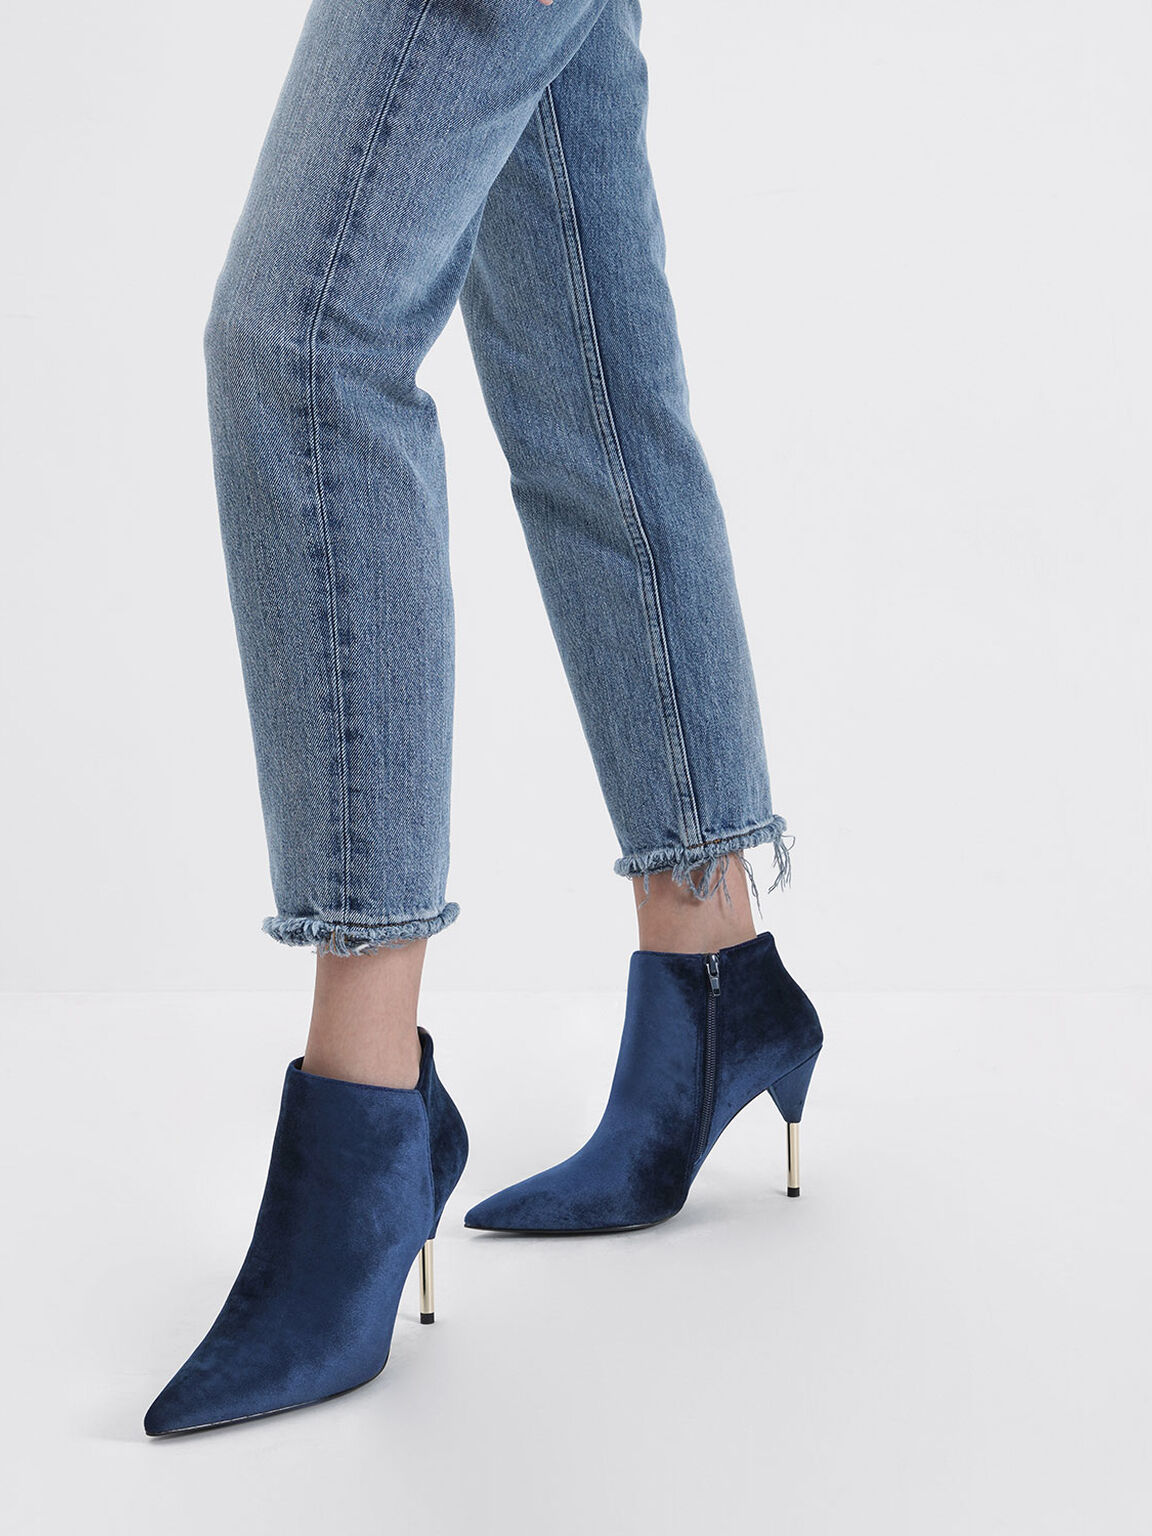 Velvet Metallic Stiletto Heel Ankle Boots, Dark Blue, hi-res